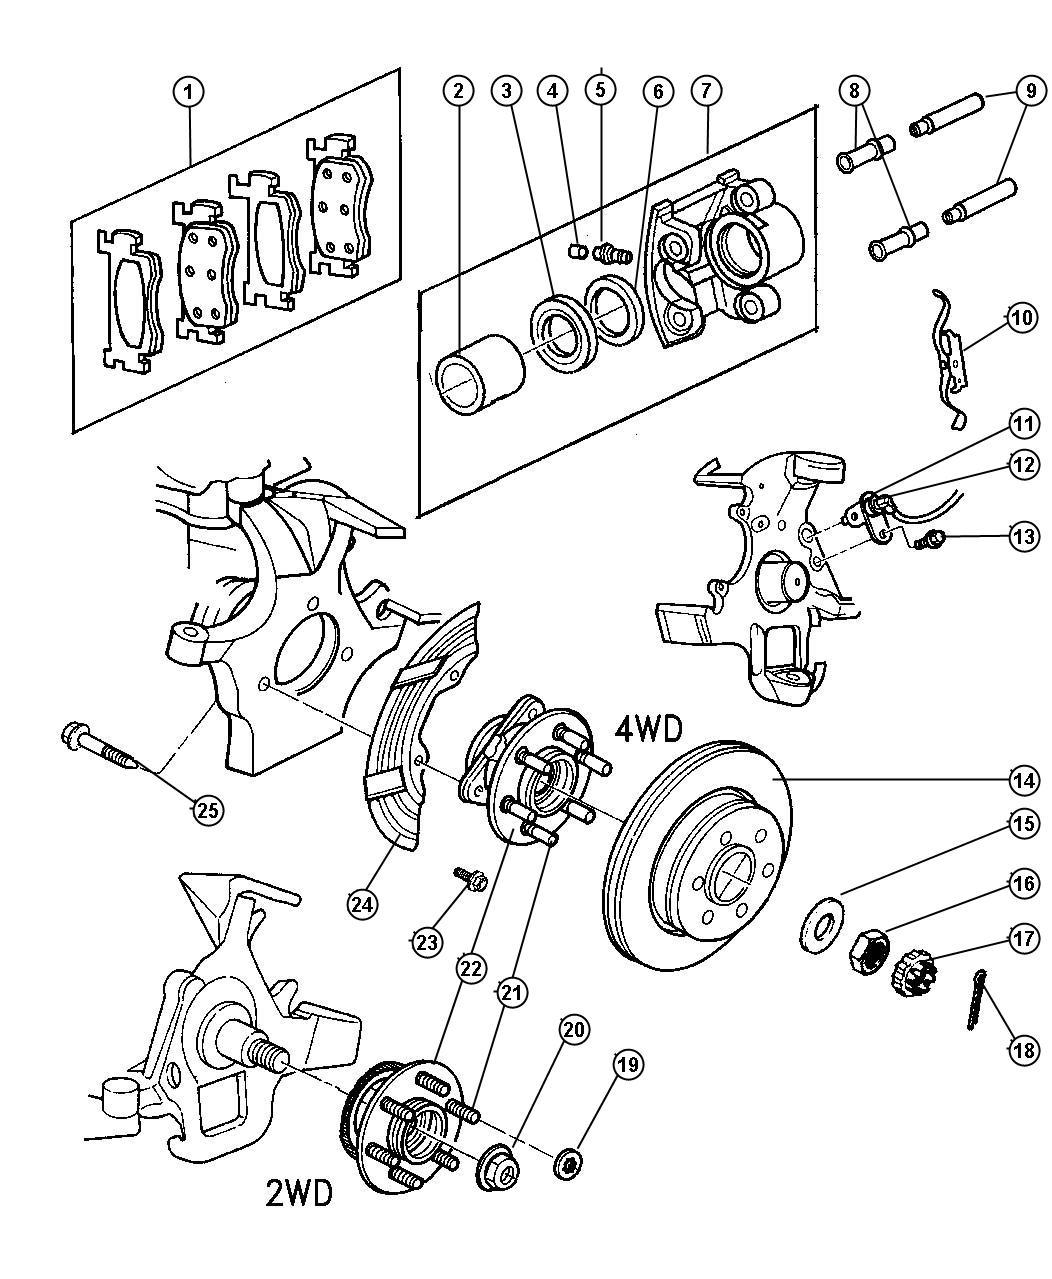 Dodge Durango Nut Hex Flange M22x1 25 Bearing Hub